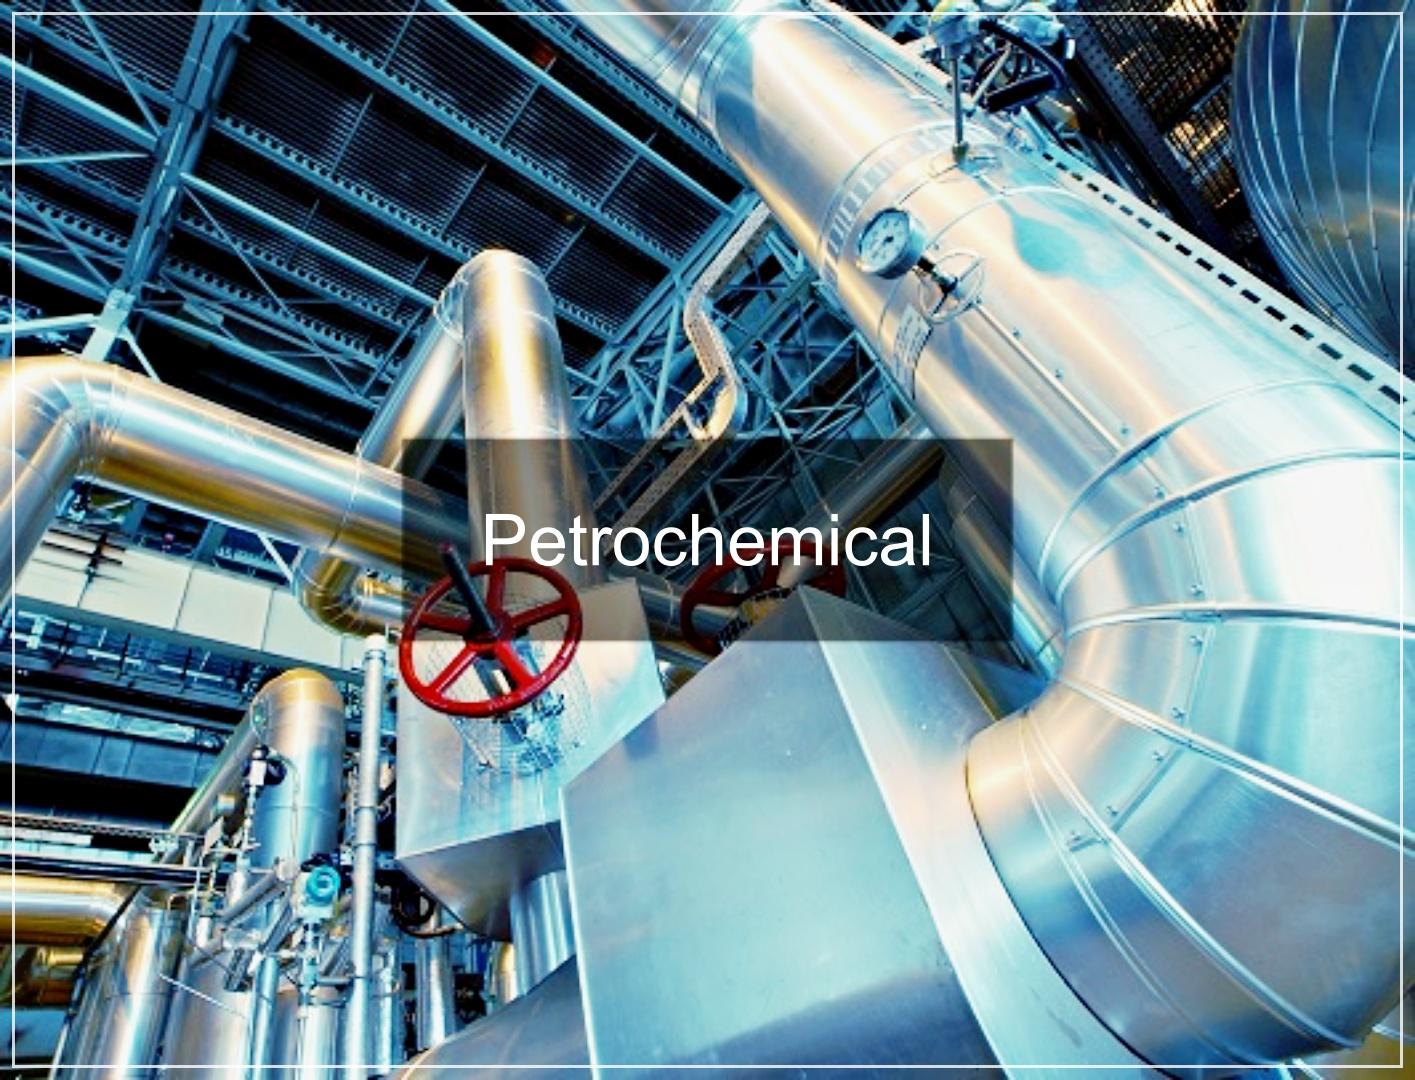 columnpetrol-chemicaltext